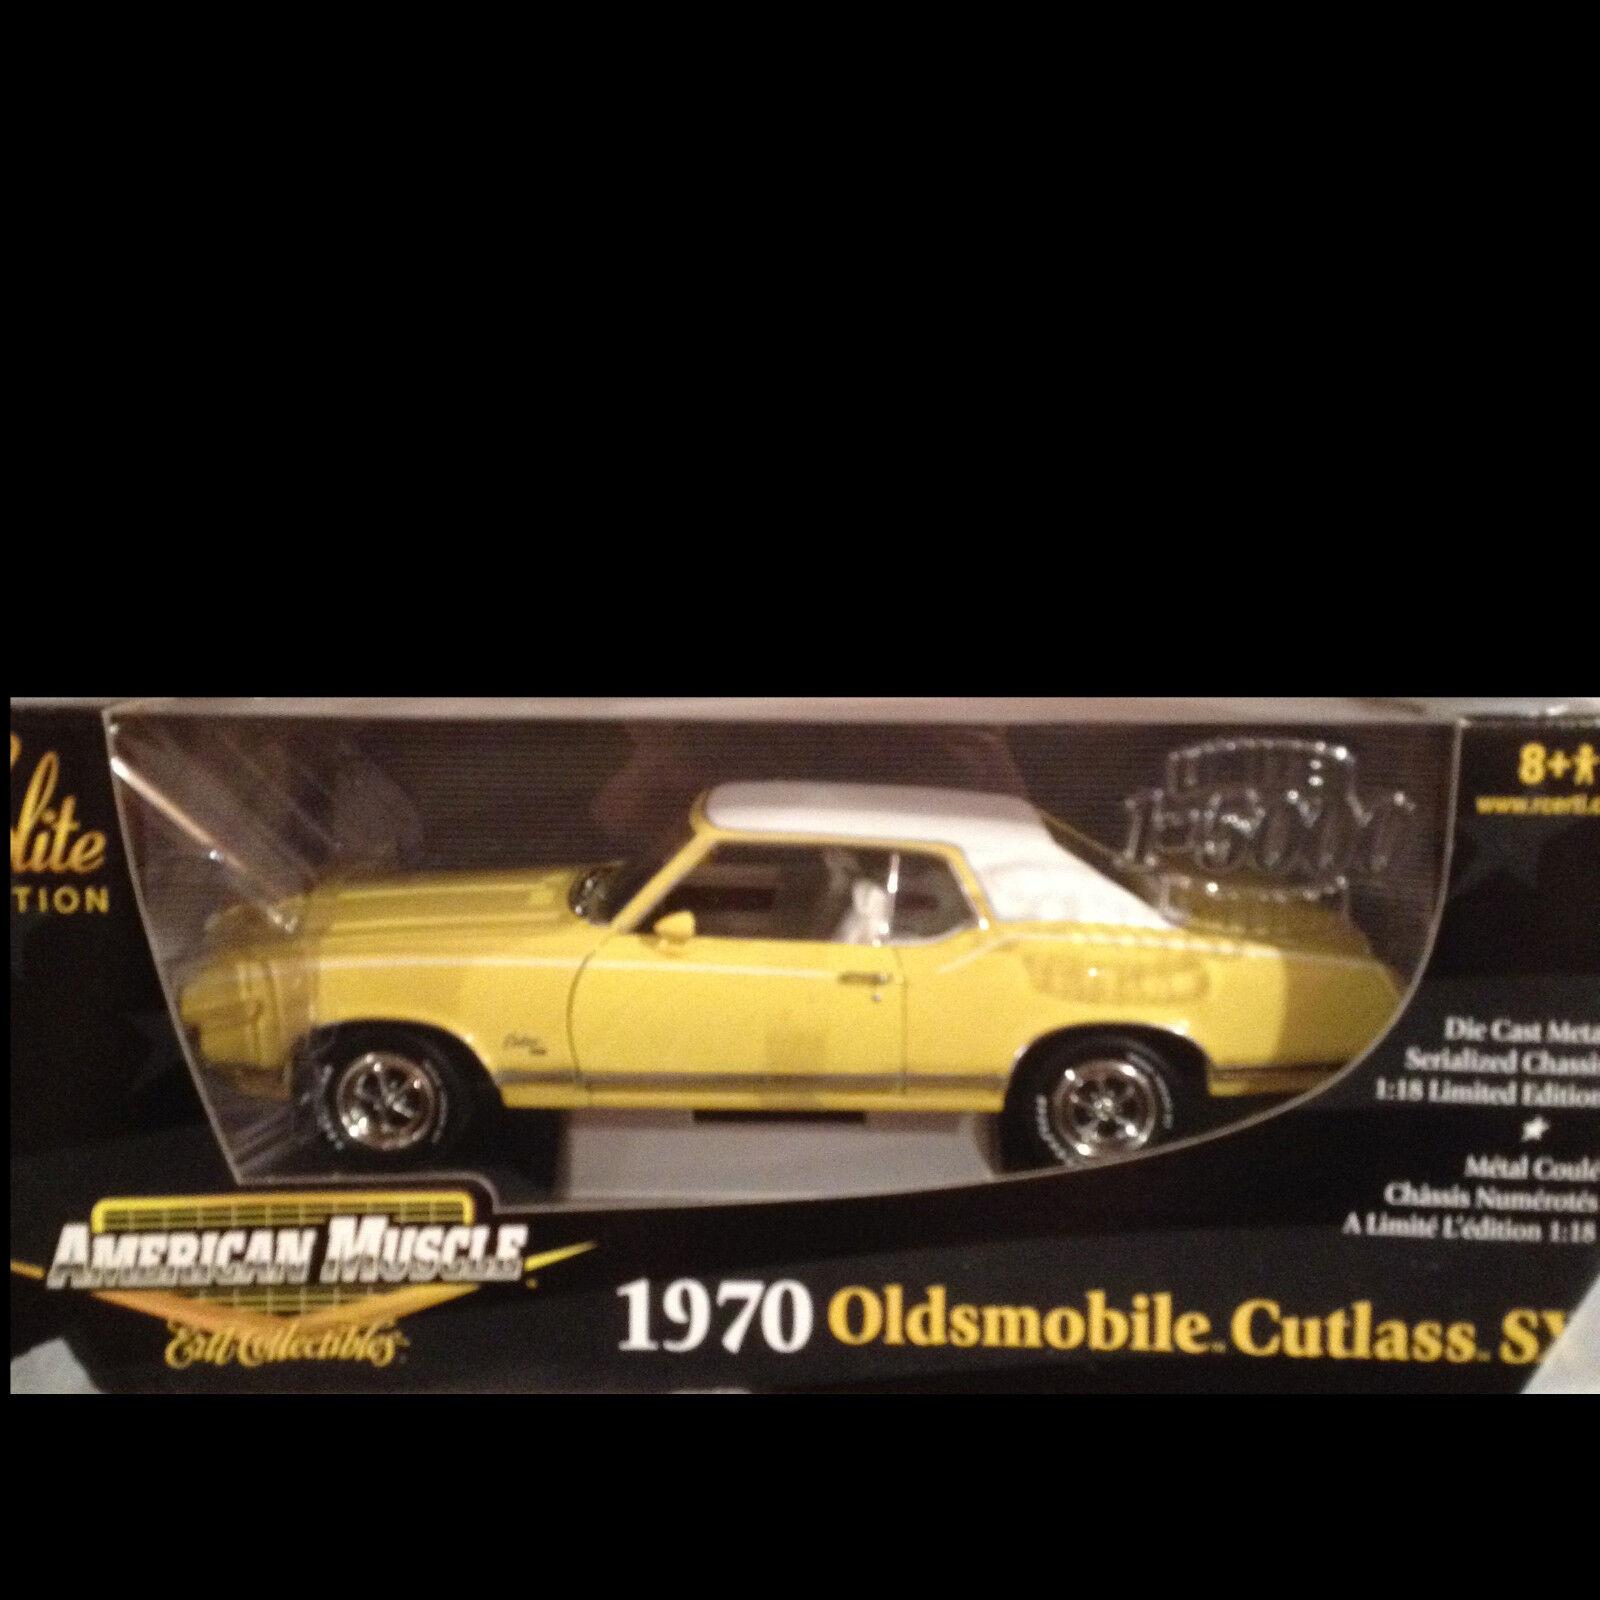 1970 Cutlass SX Sebring giallo Oldsmobile 1 18 Ertl American Muscle 33770